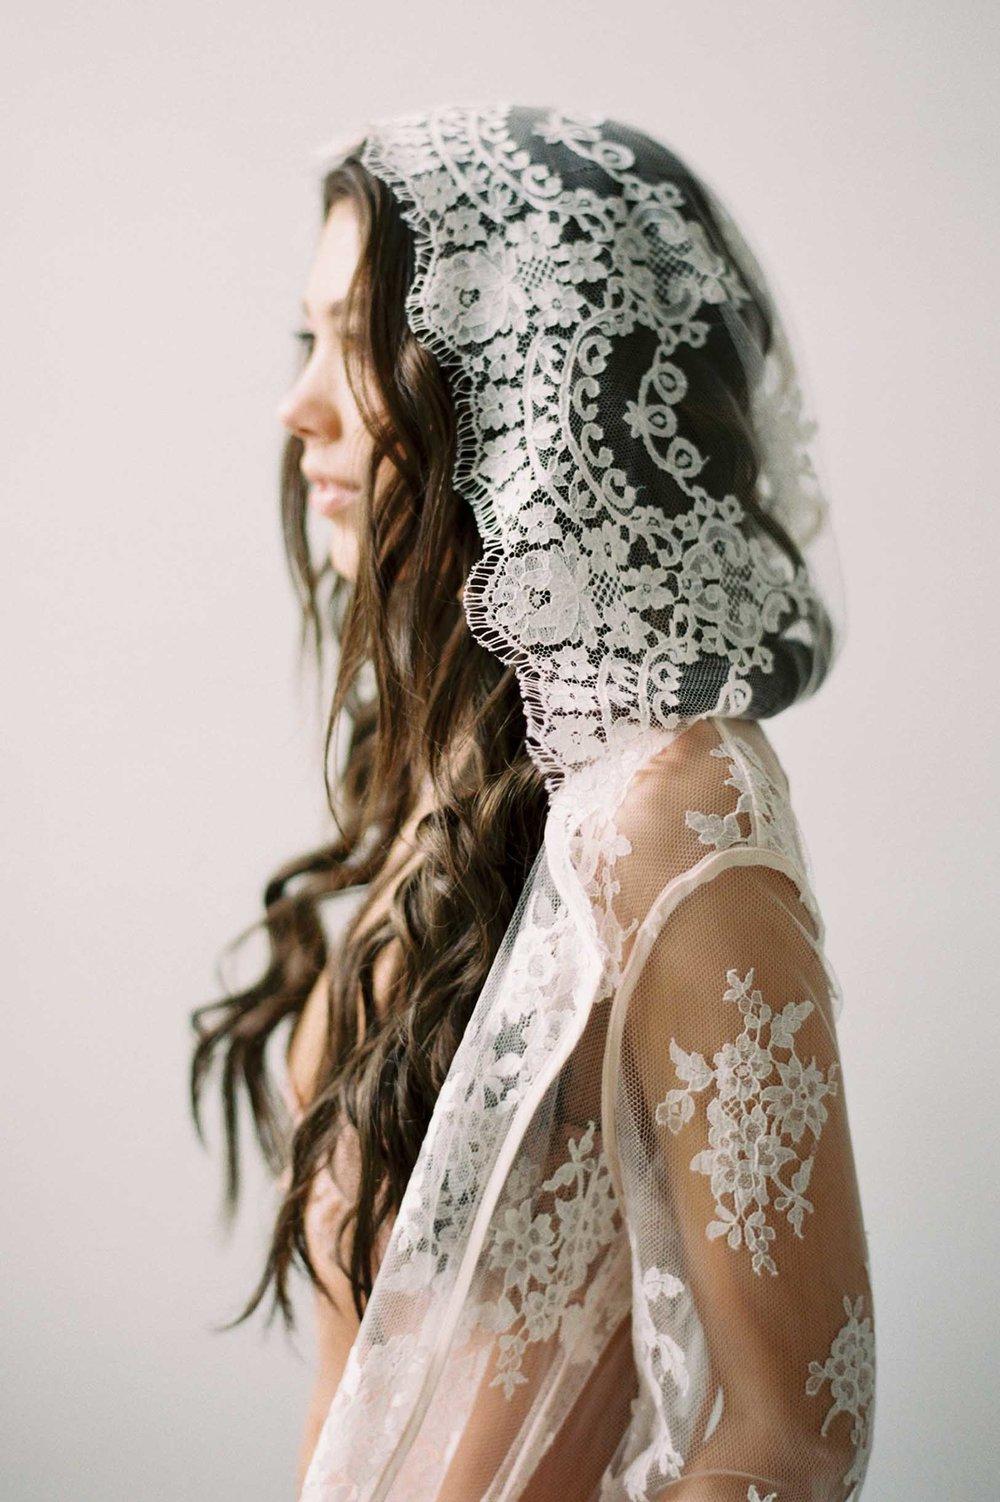 GirlandaSeriousDream Stella lace robe hooded hoodie French calais dentelle ivory bride boudoir.jpg